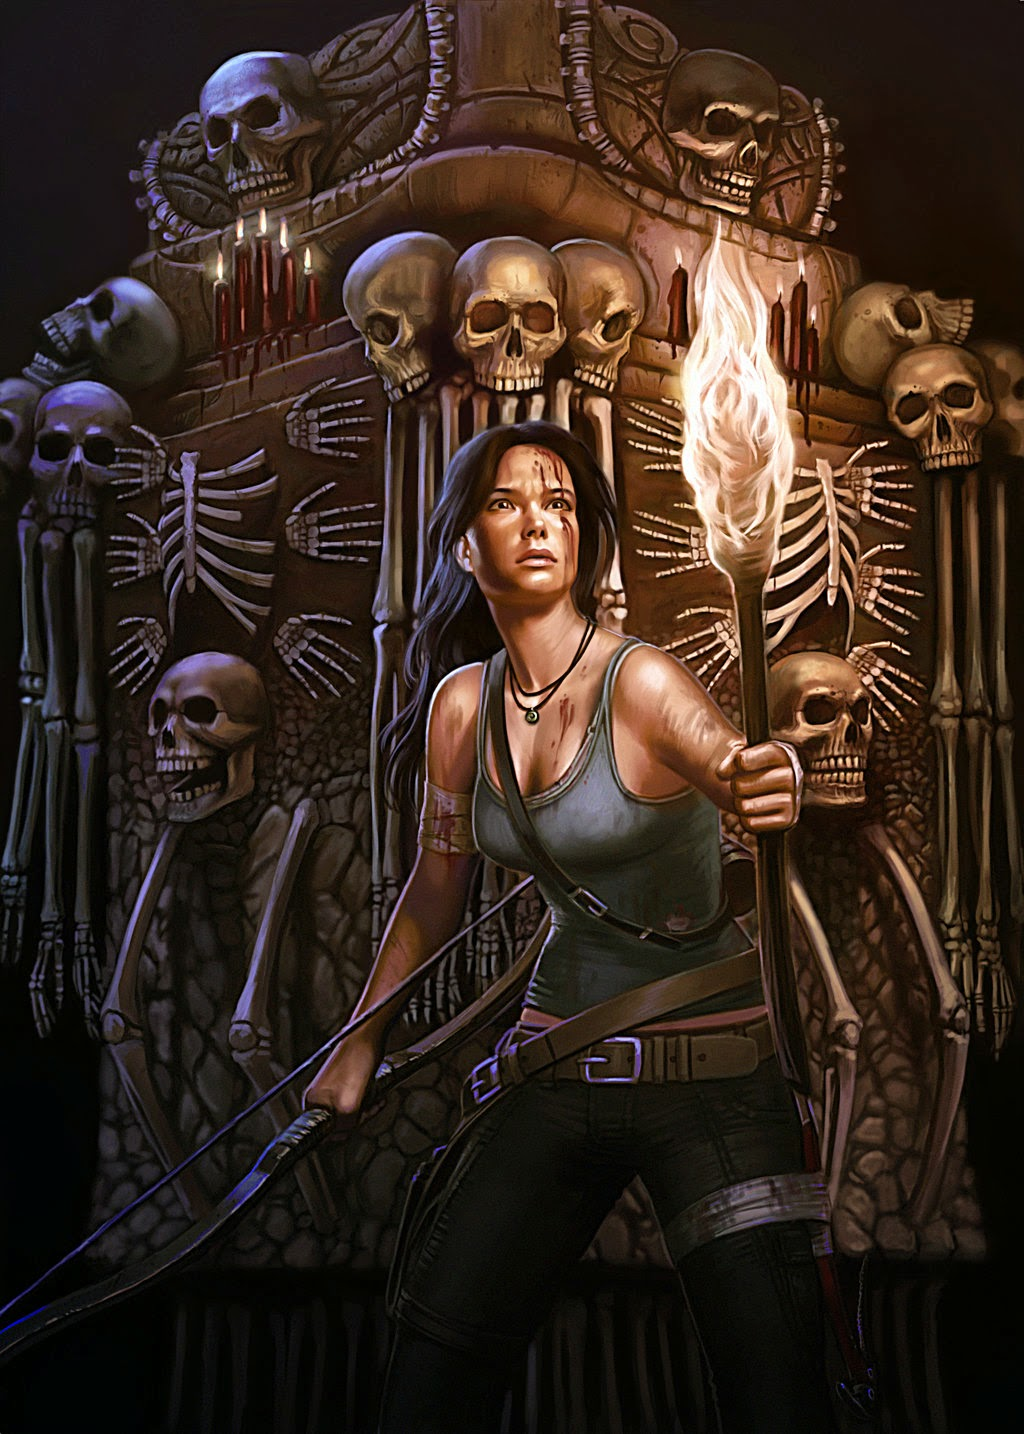 illustration de LaVata E. O'neal représentant Lara croft du jeu Tomb raider